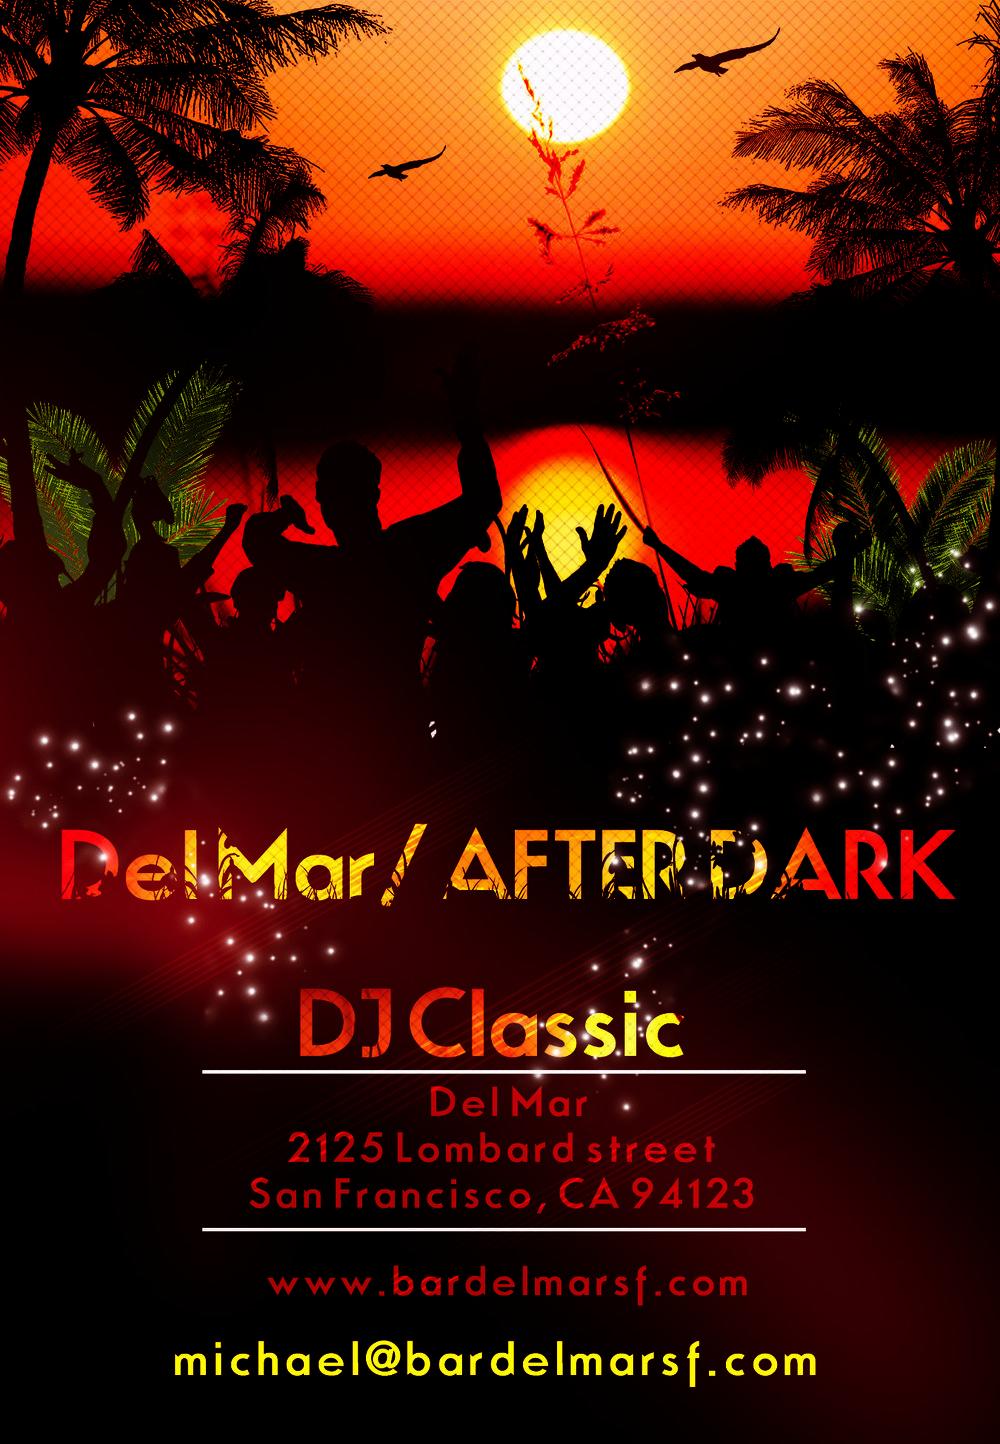 Del Mar After Dark flyer DJ Classic.jpg